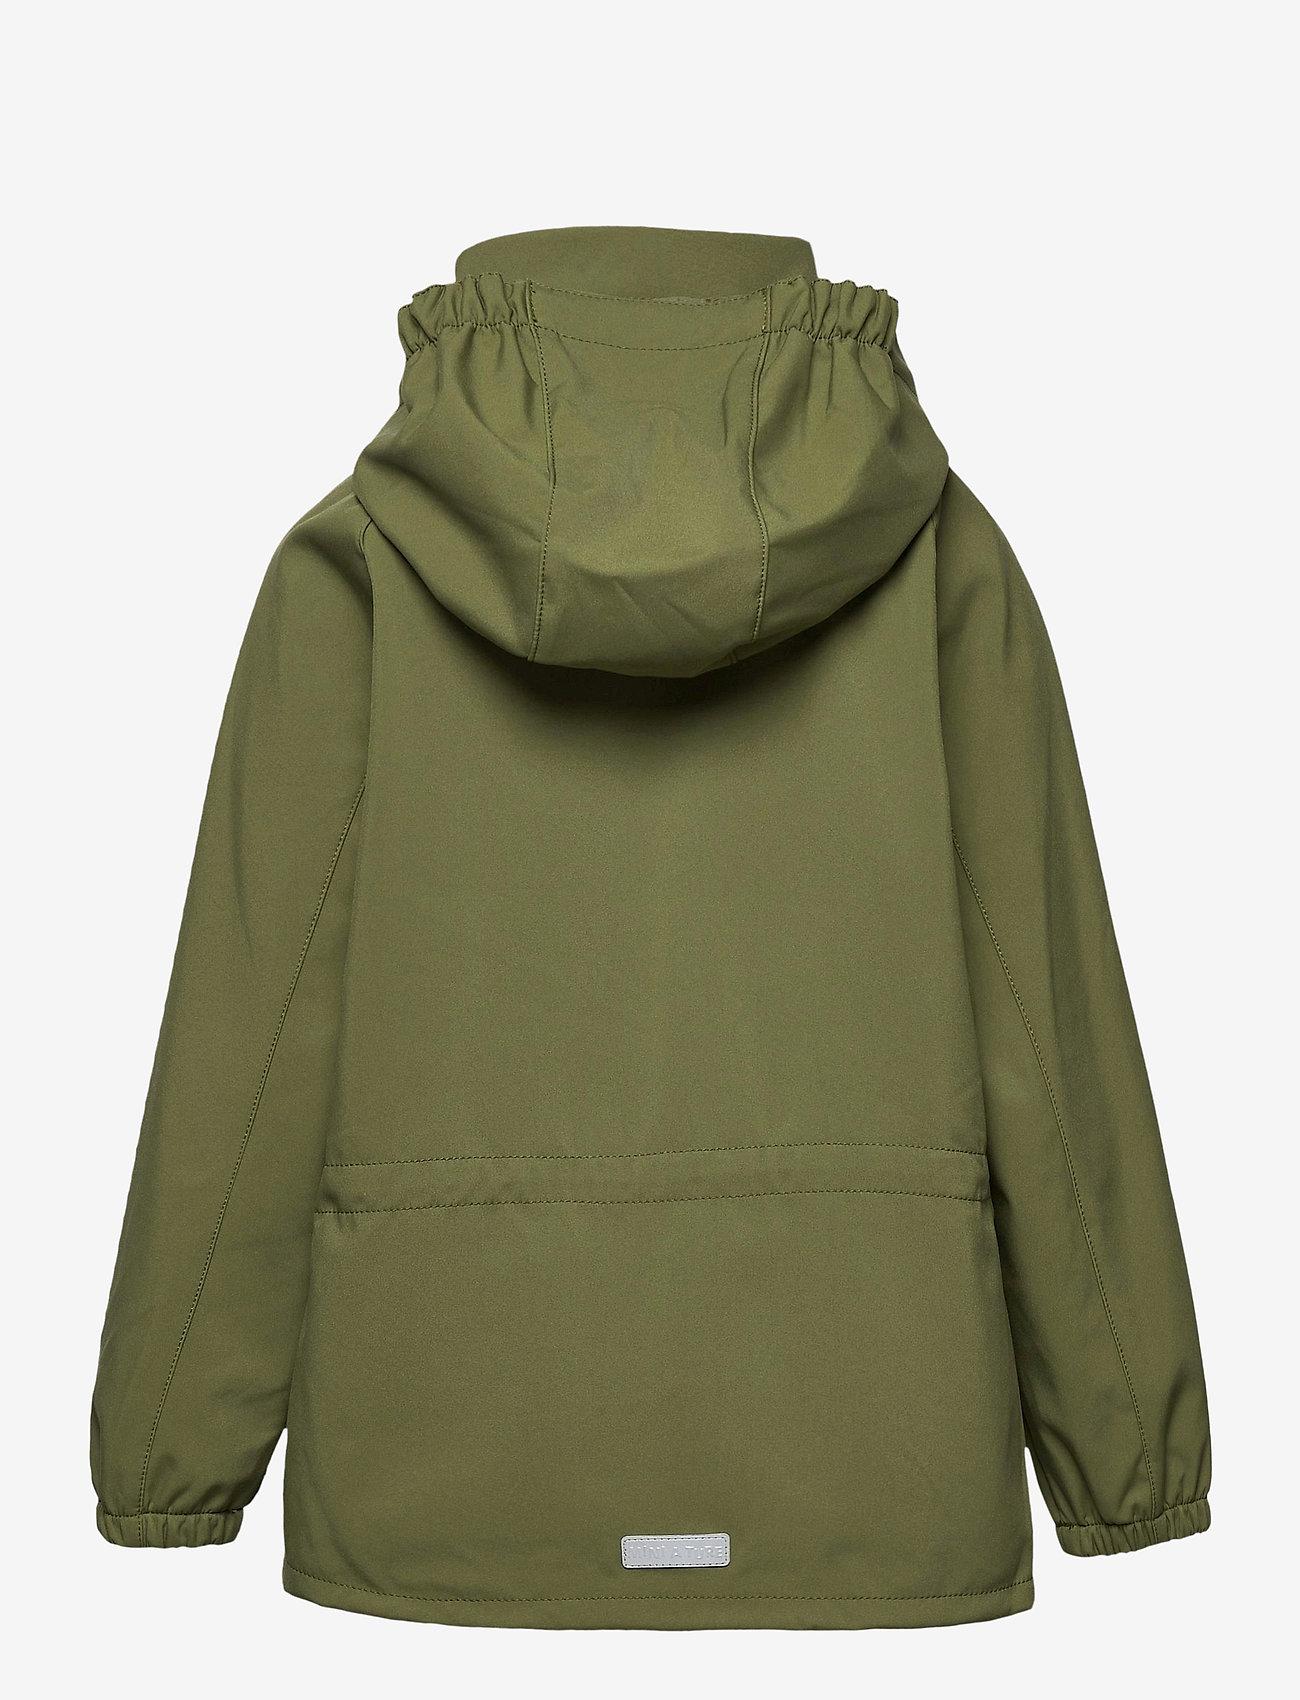 Mini A Ture - Aden Jacket, MK - shell jackets - olivine green - 1